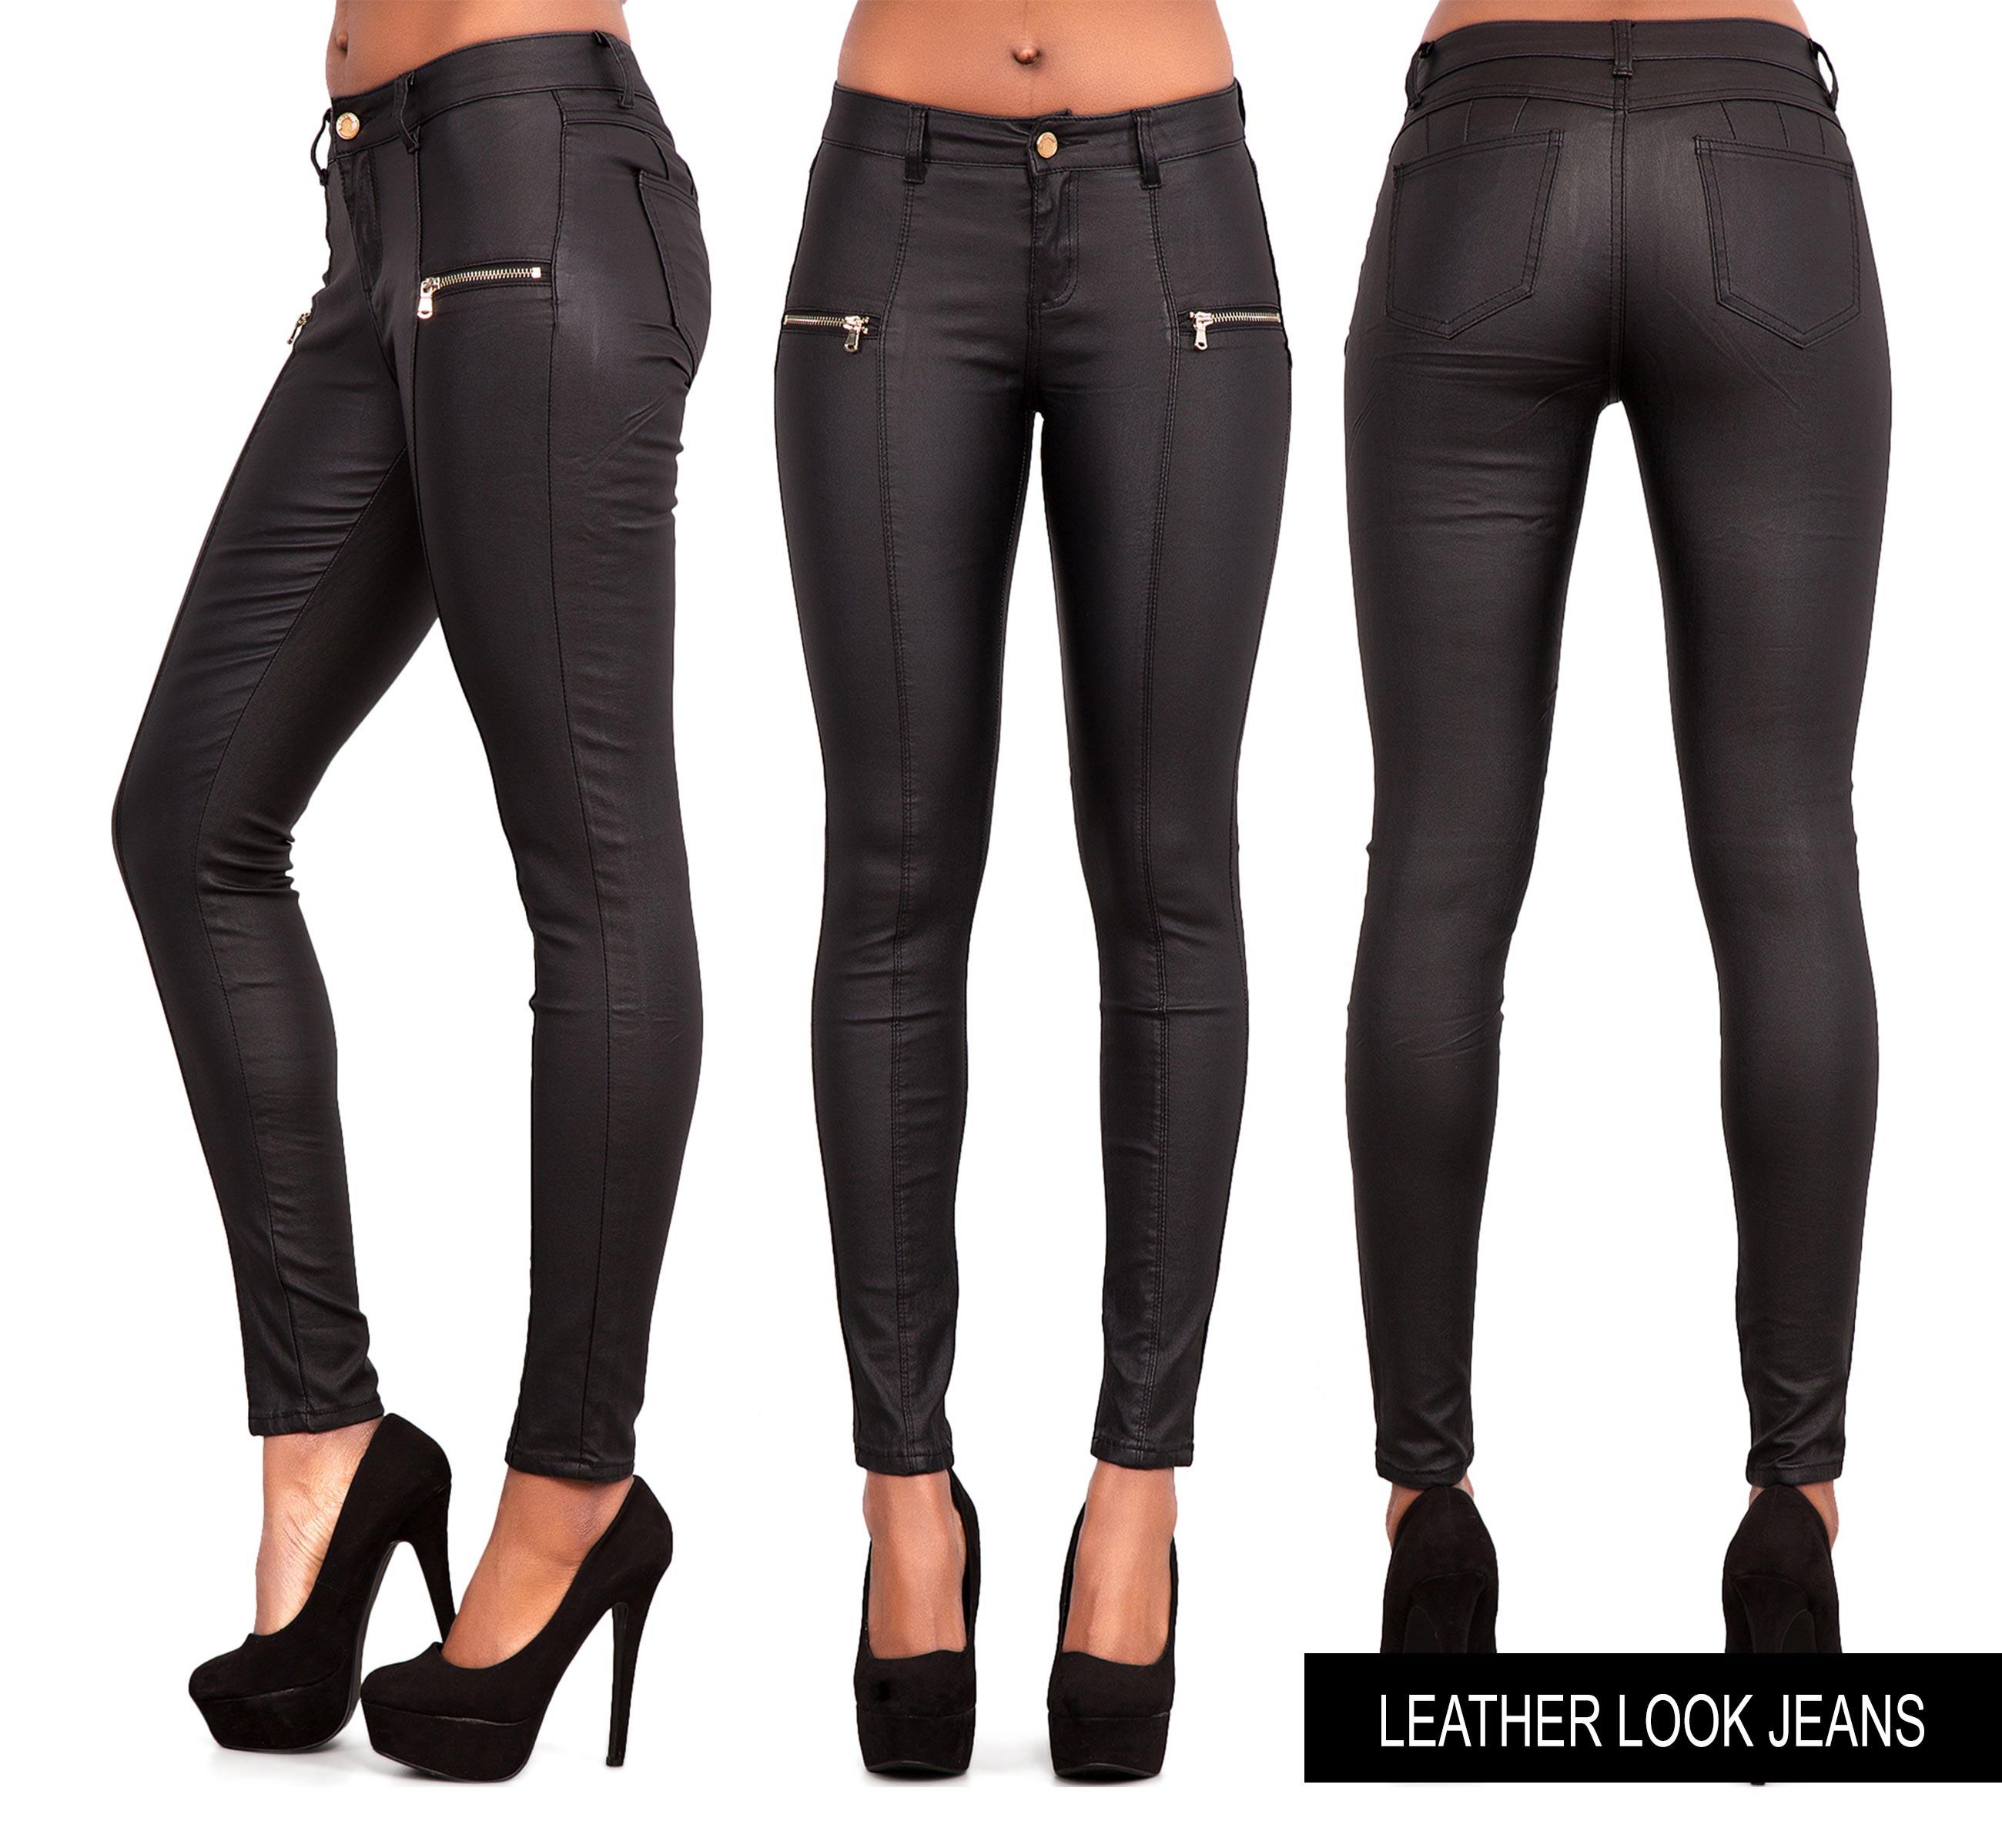 Awesome 2016 New Skinny Jeans Lady Jeans Pants Black Low Waist Slim Pencil Pants Denim Jeans Women ...